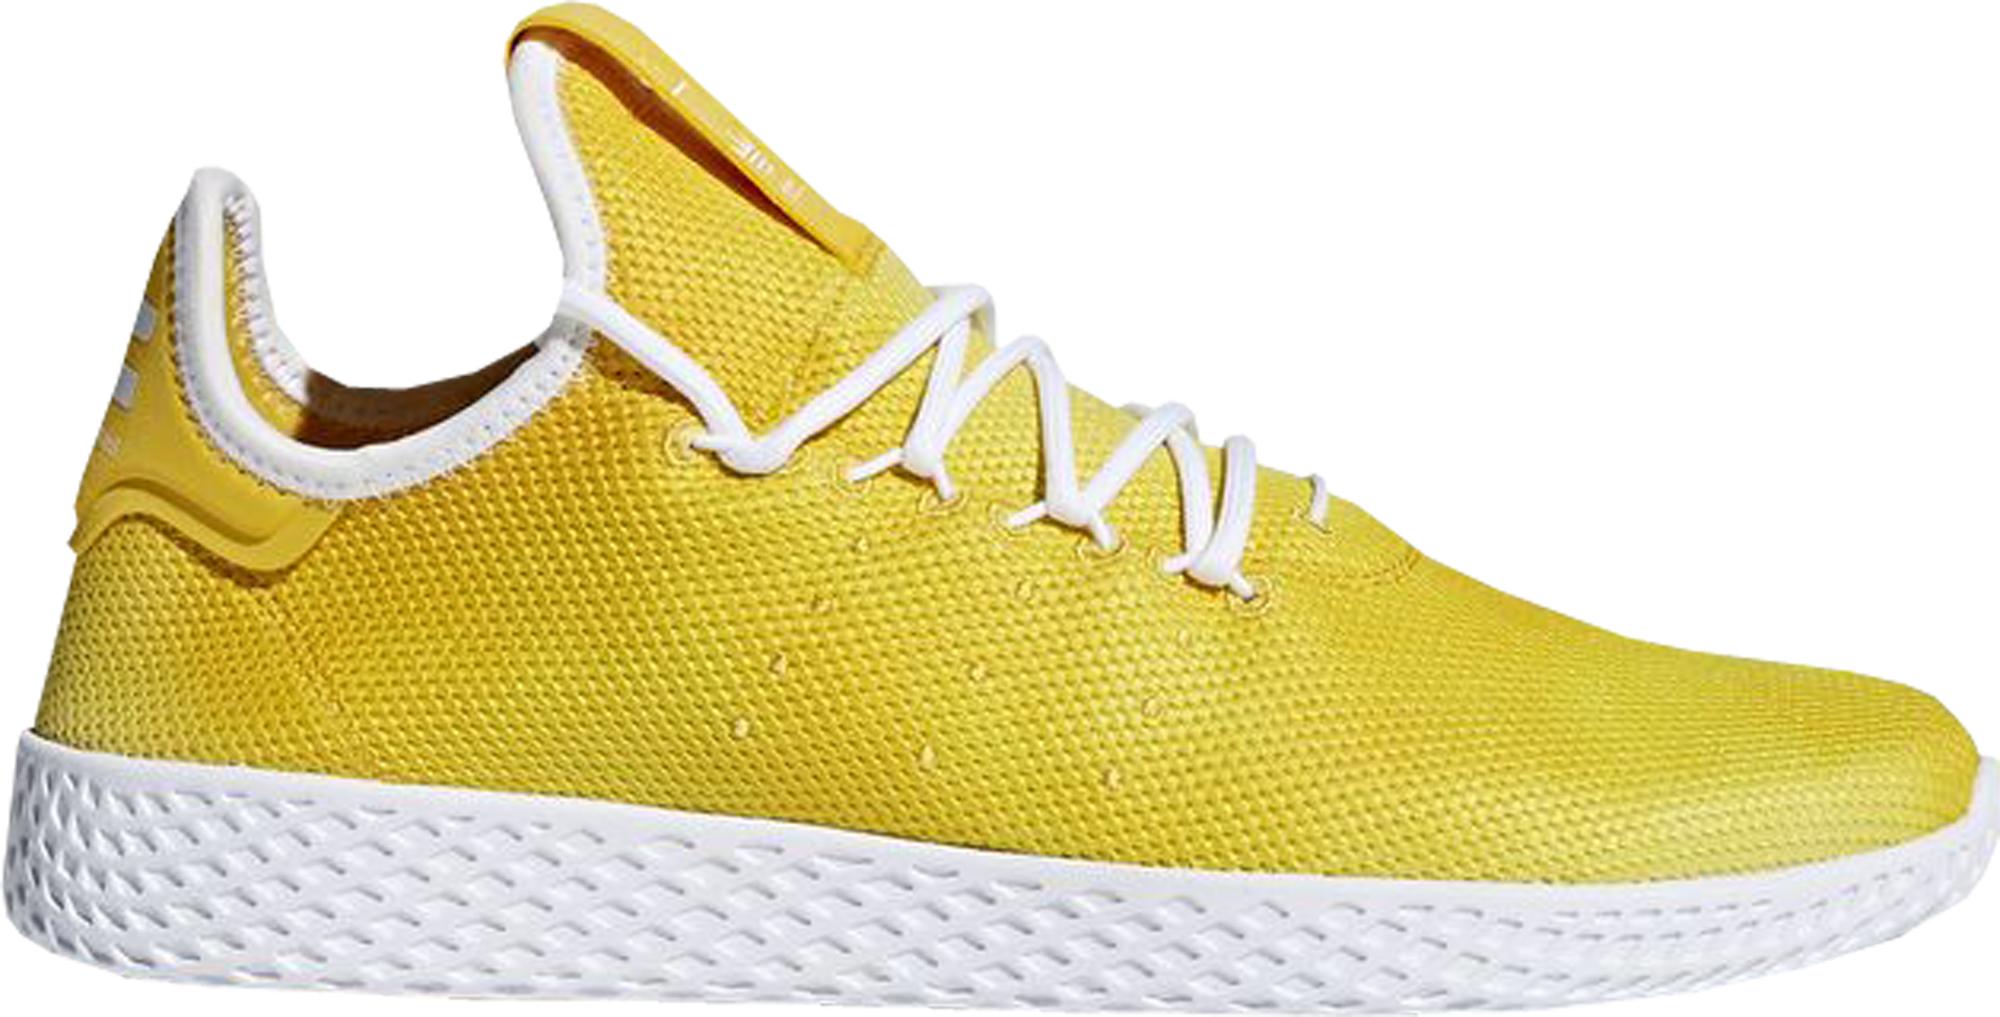 adidas Tennis HU Pharrell Holi Yellow